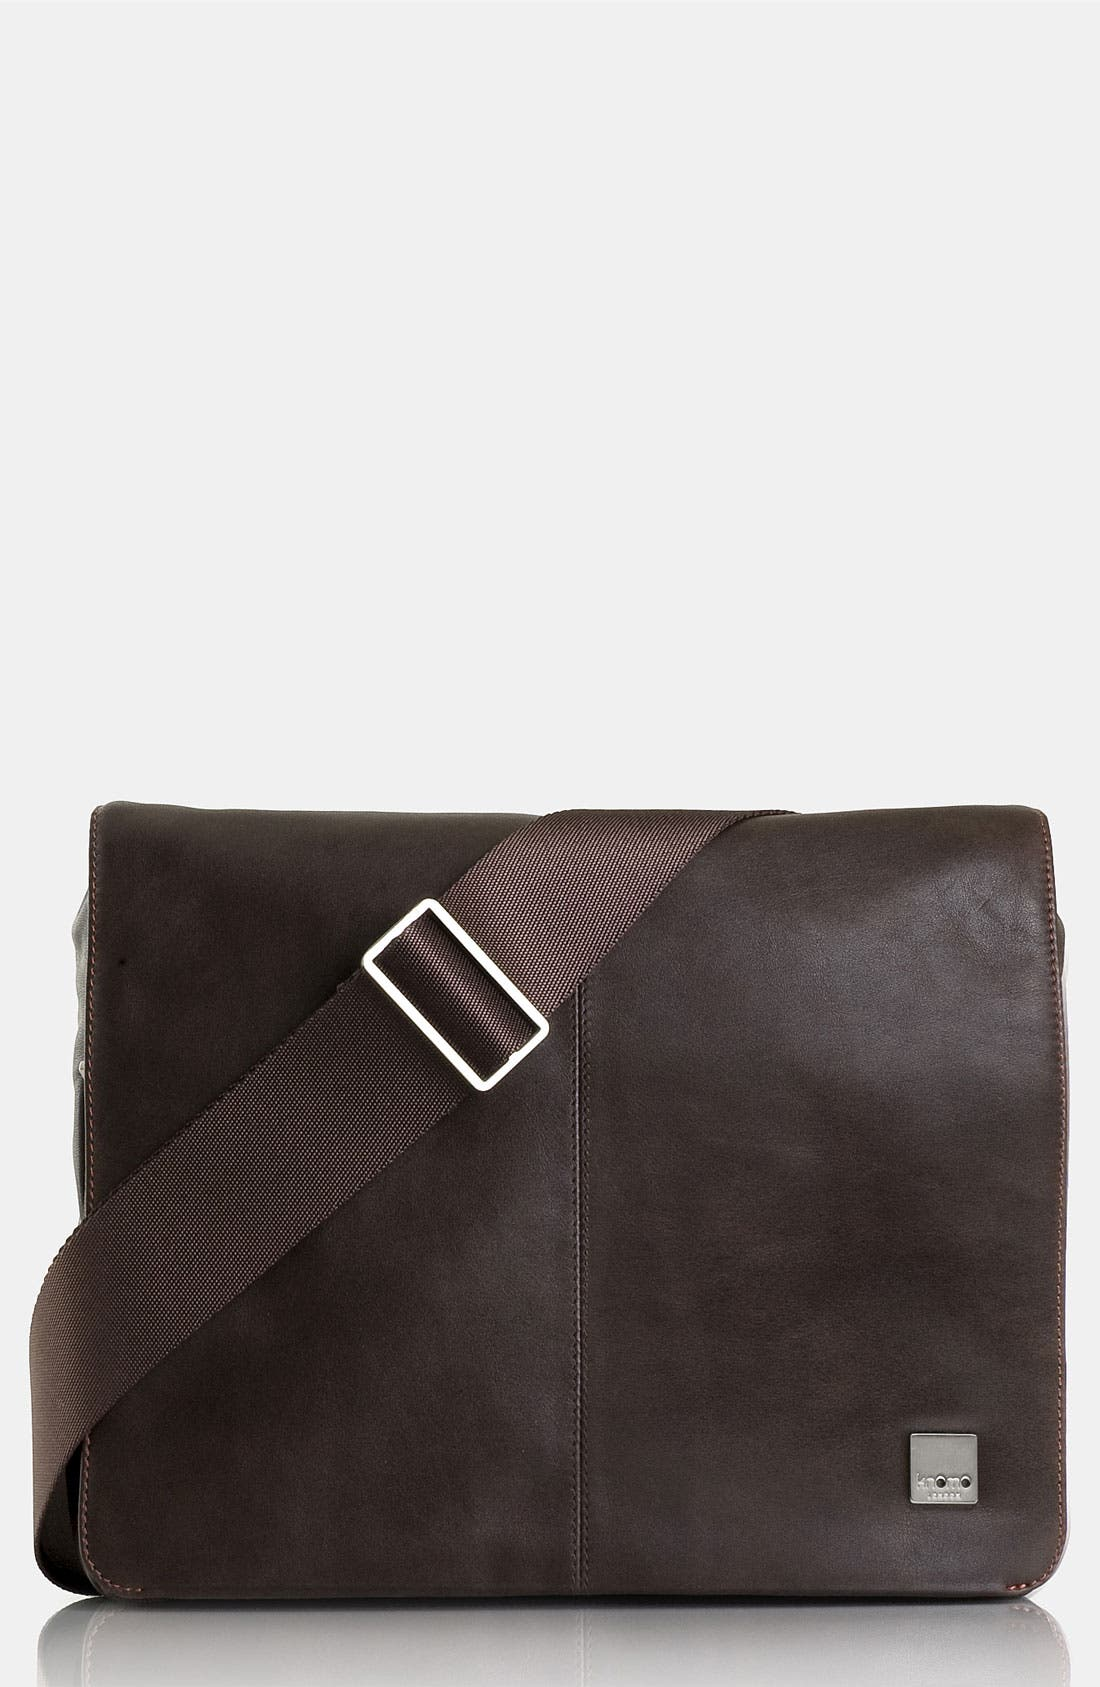 Alternate Image 1 Selected - KNOMO London 'Kilkenny' Messenger Bag (11 Inch)